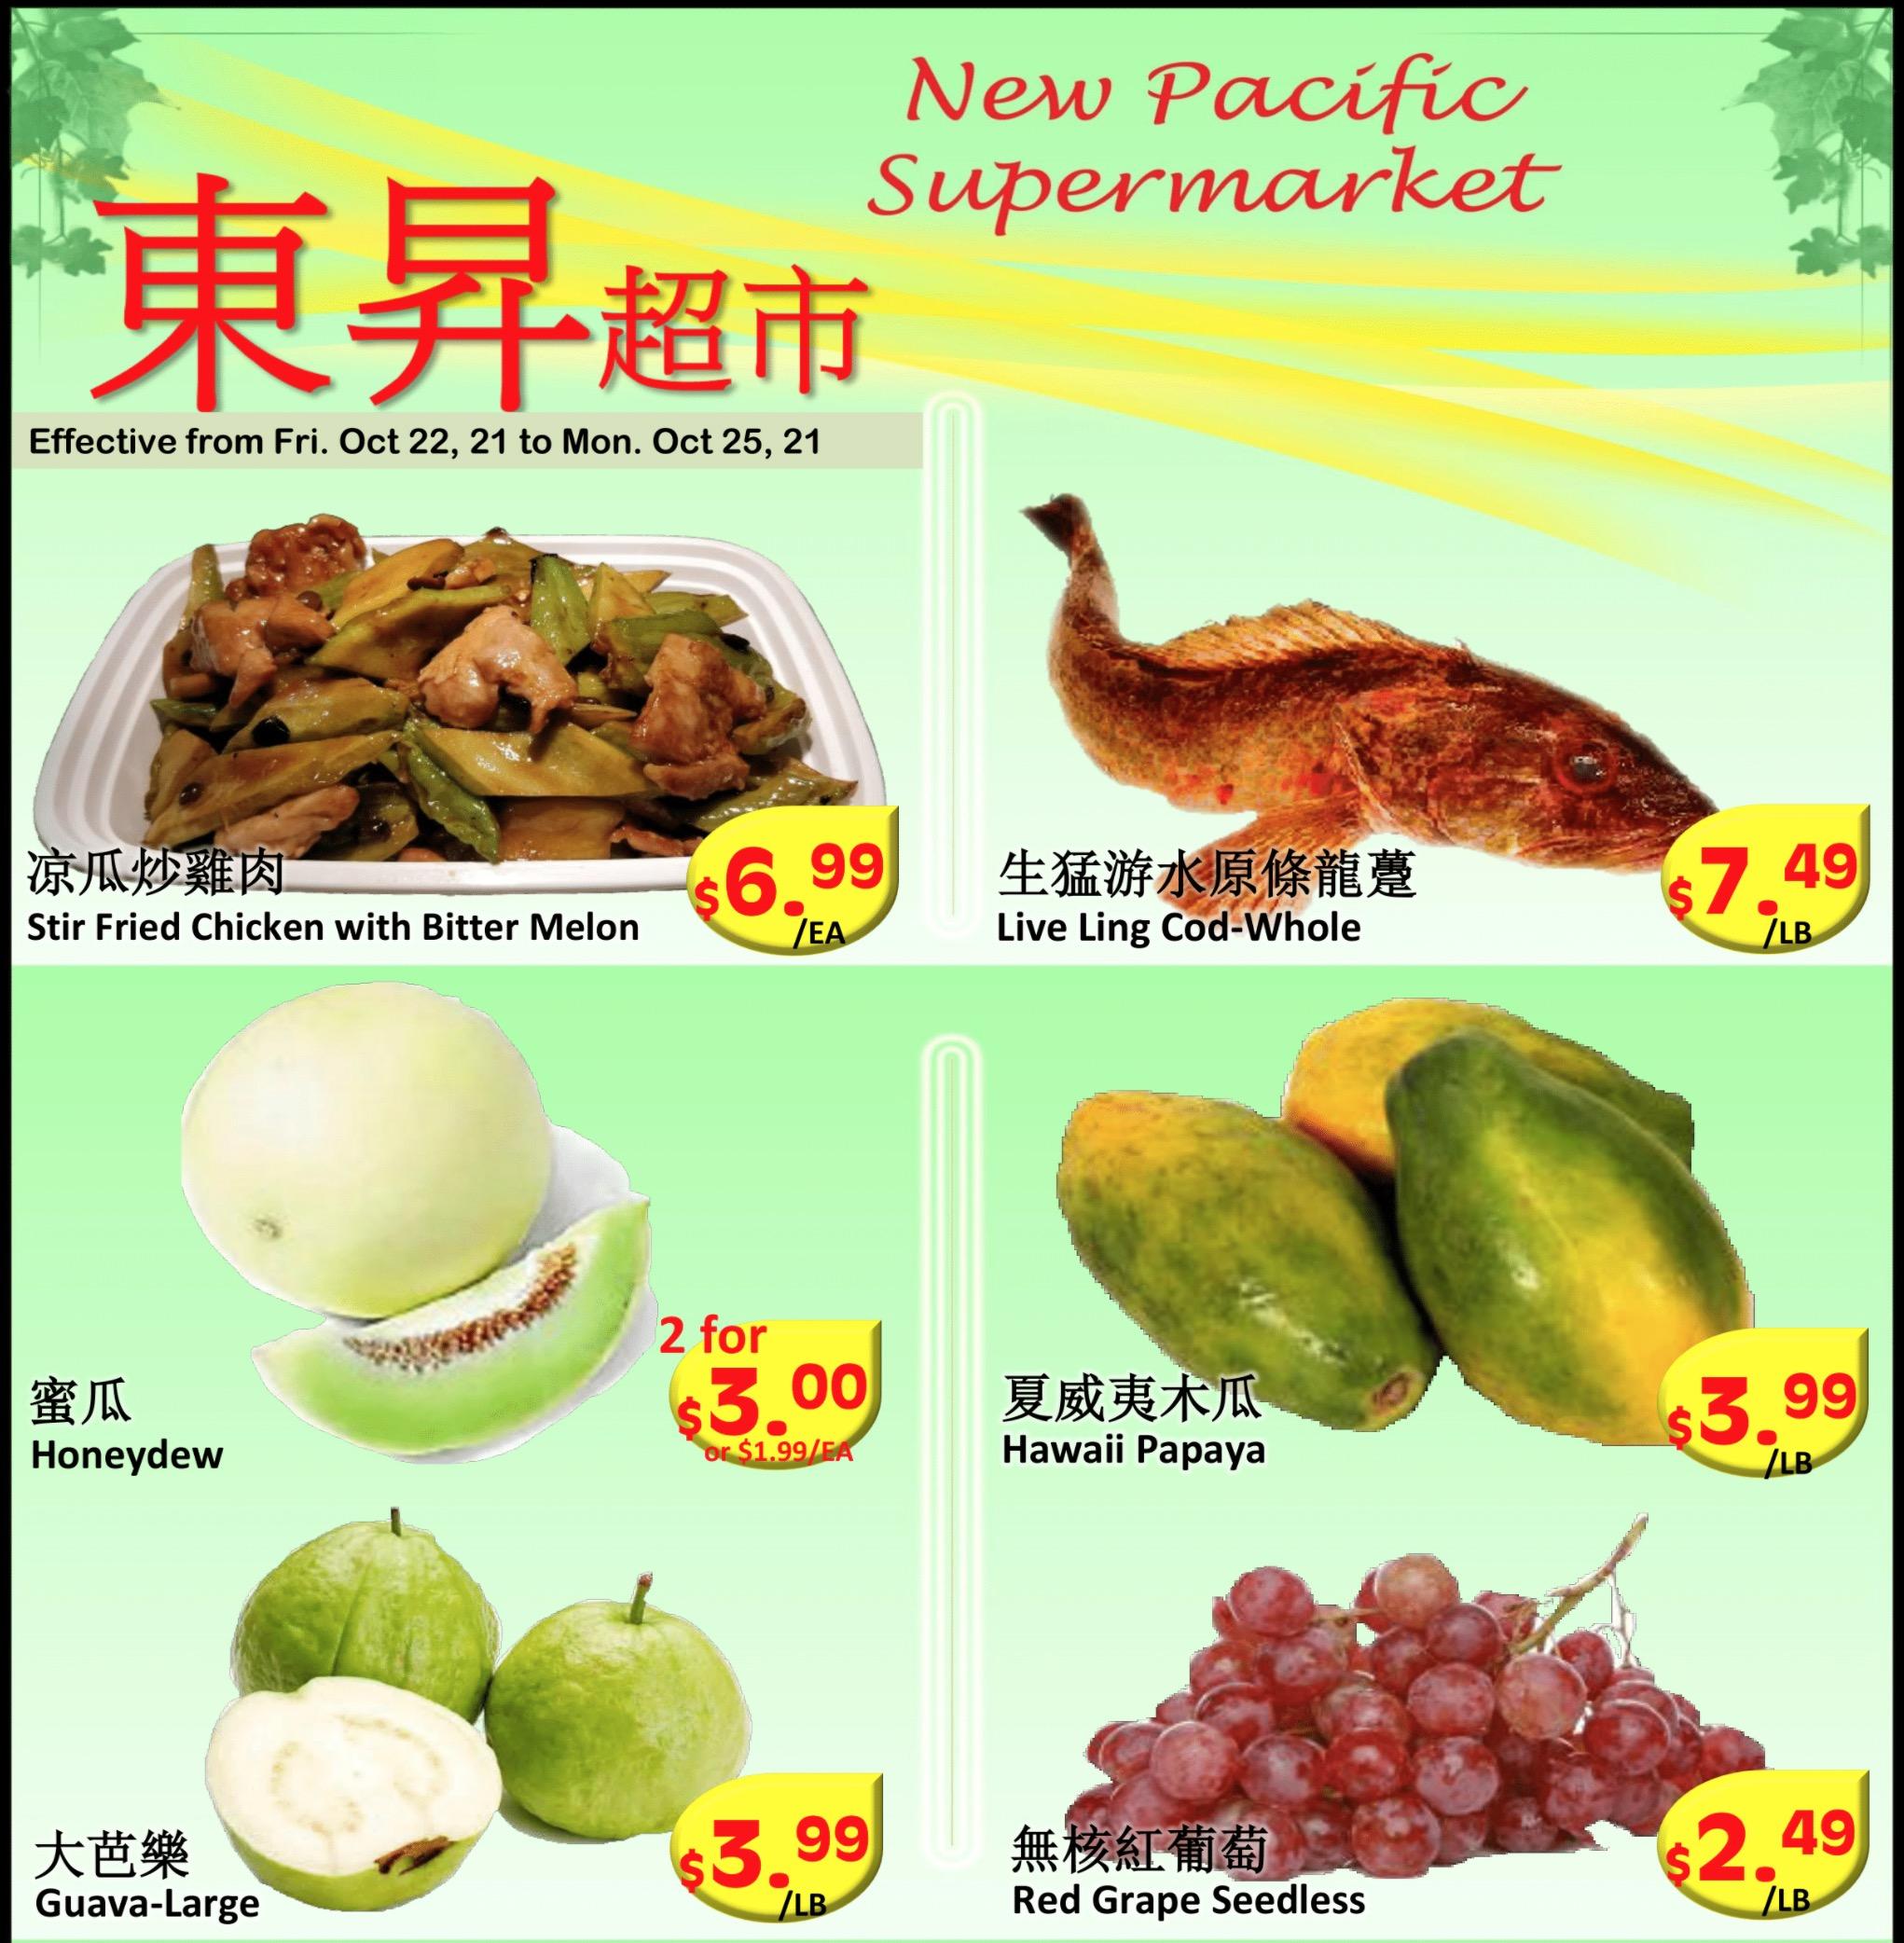 New Pacific Supermarket Flyer | Oct 23